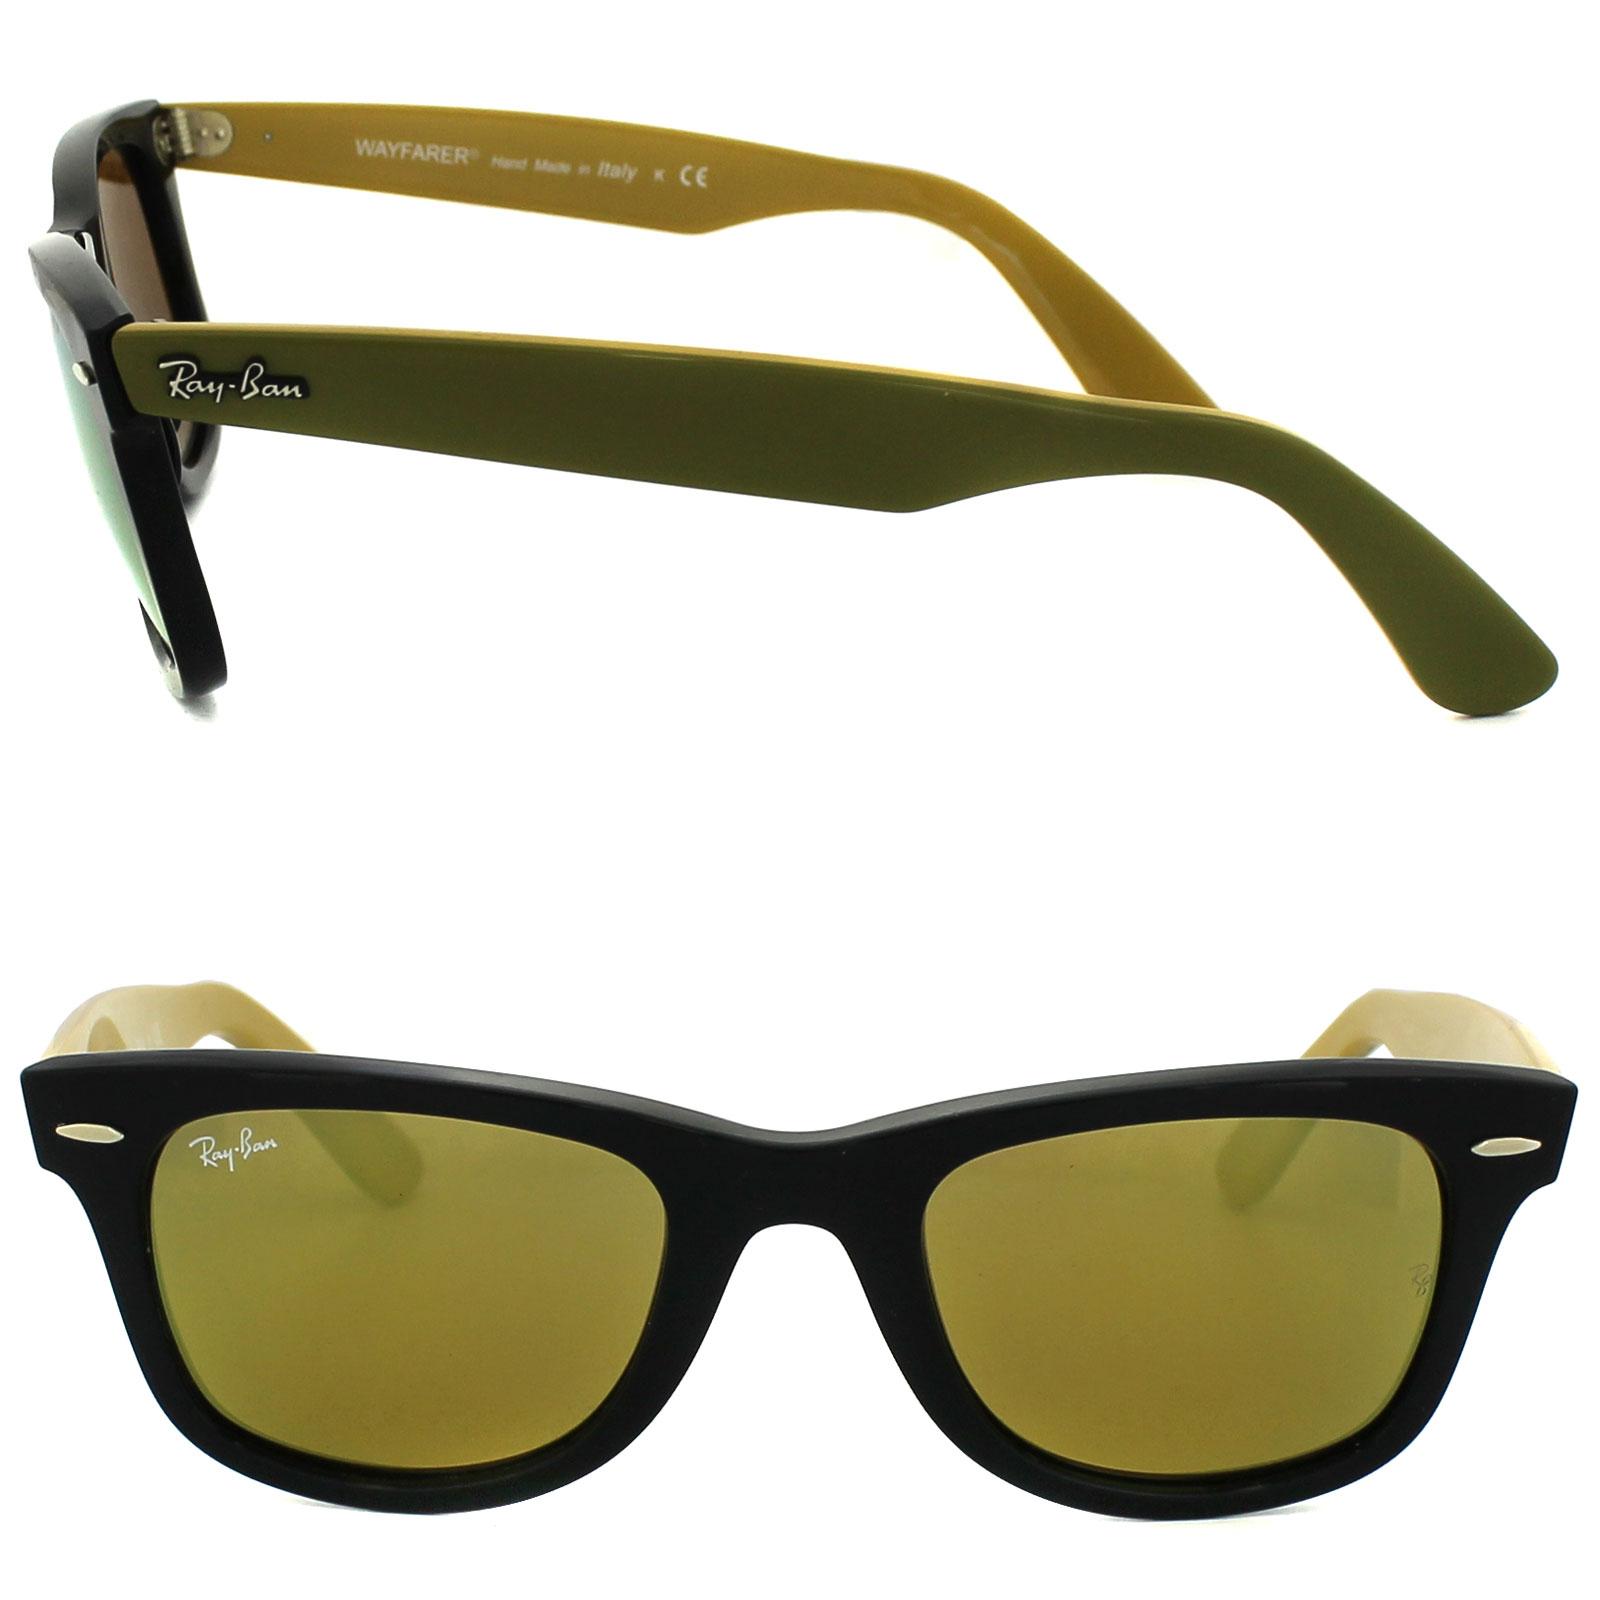 953504e866f89 Sentinel Ray-Ban Sunglasses Wayfarer 2140 117393 Bicolor Black with Green    Yellow Yellow